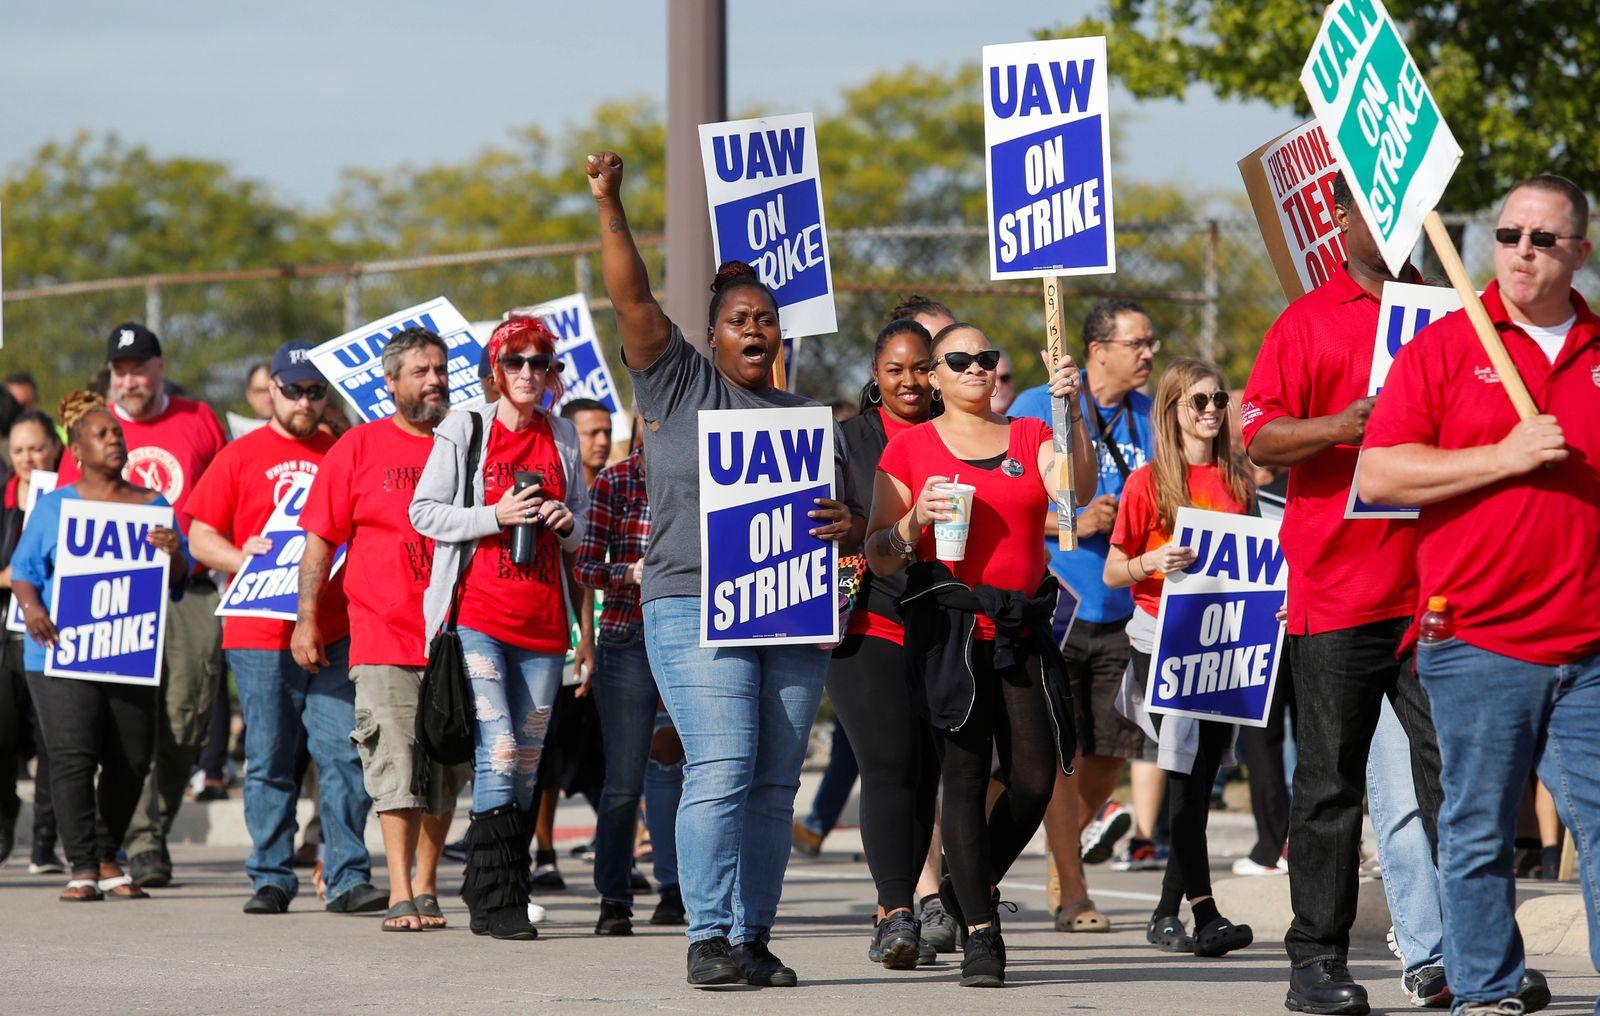 General Motors Streik / UAW / United Auto Workers